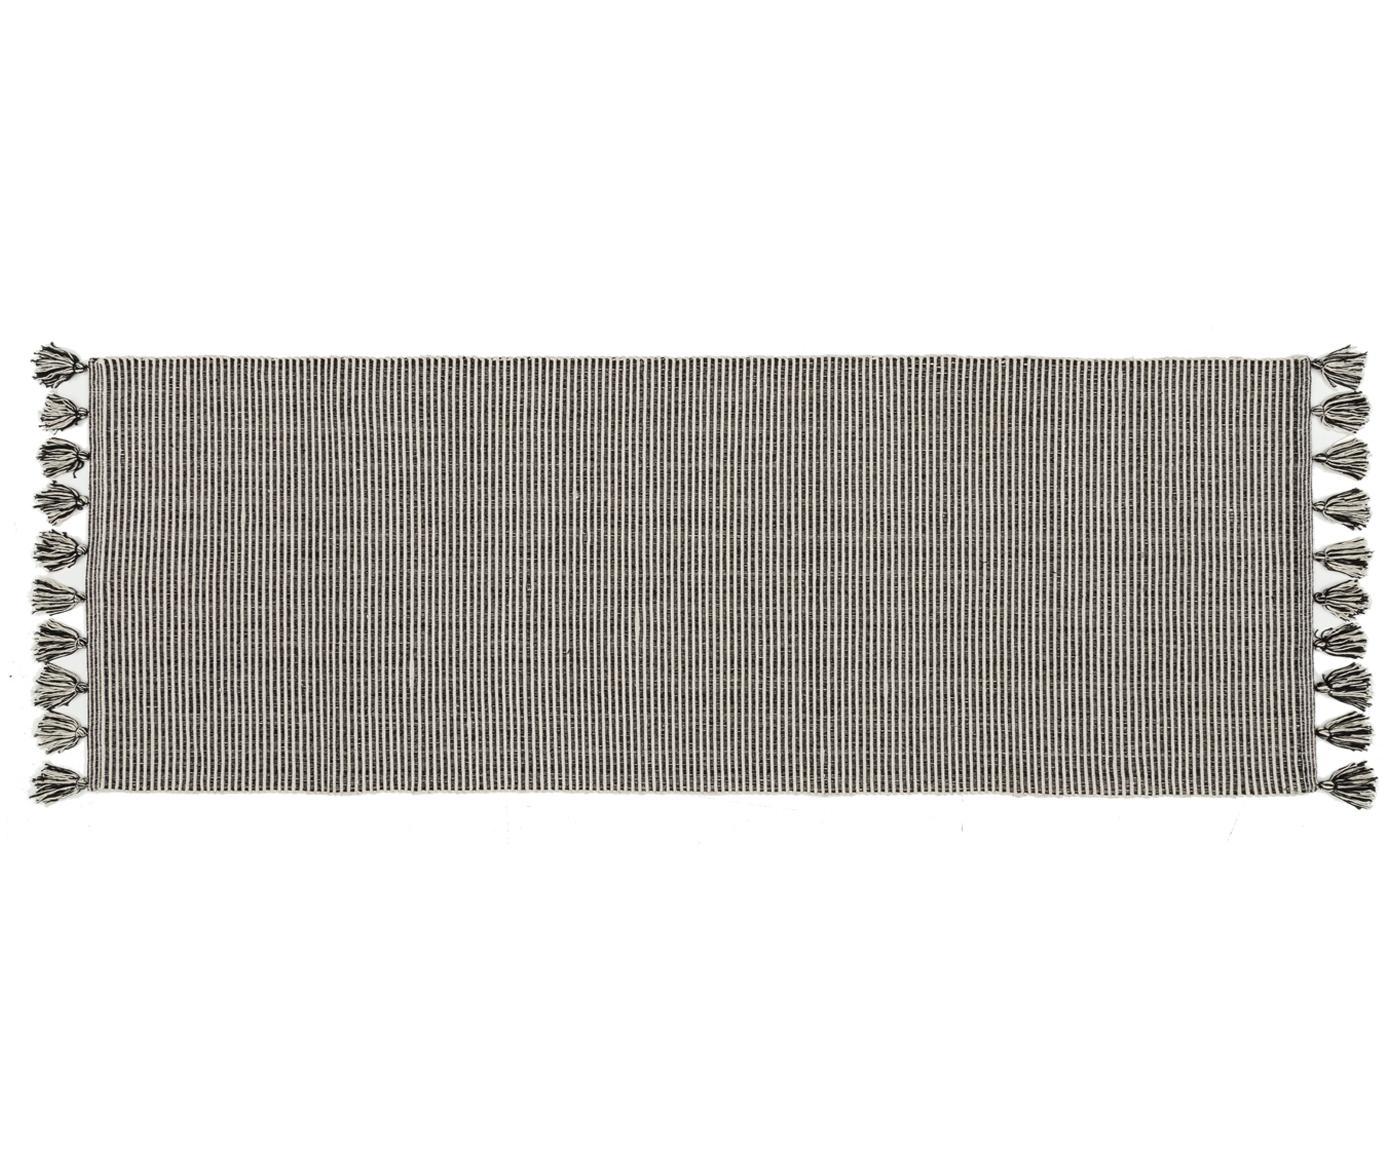 Alfombra con borlas Homer, Algodón, Blanco crudo, negro jaspeado, An 70 x L 216 cm